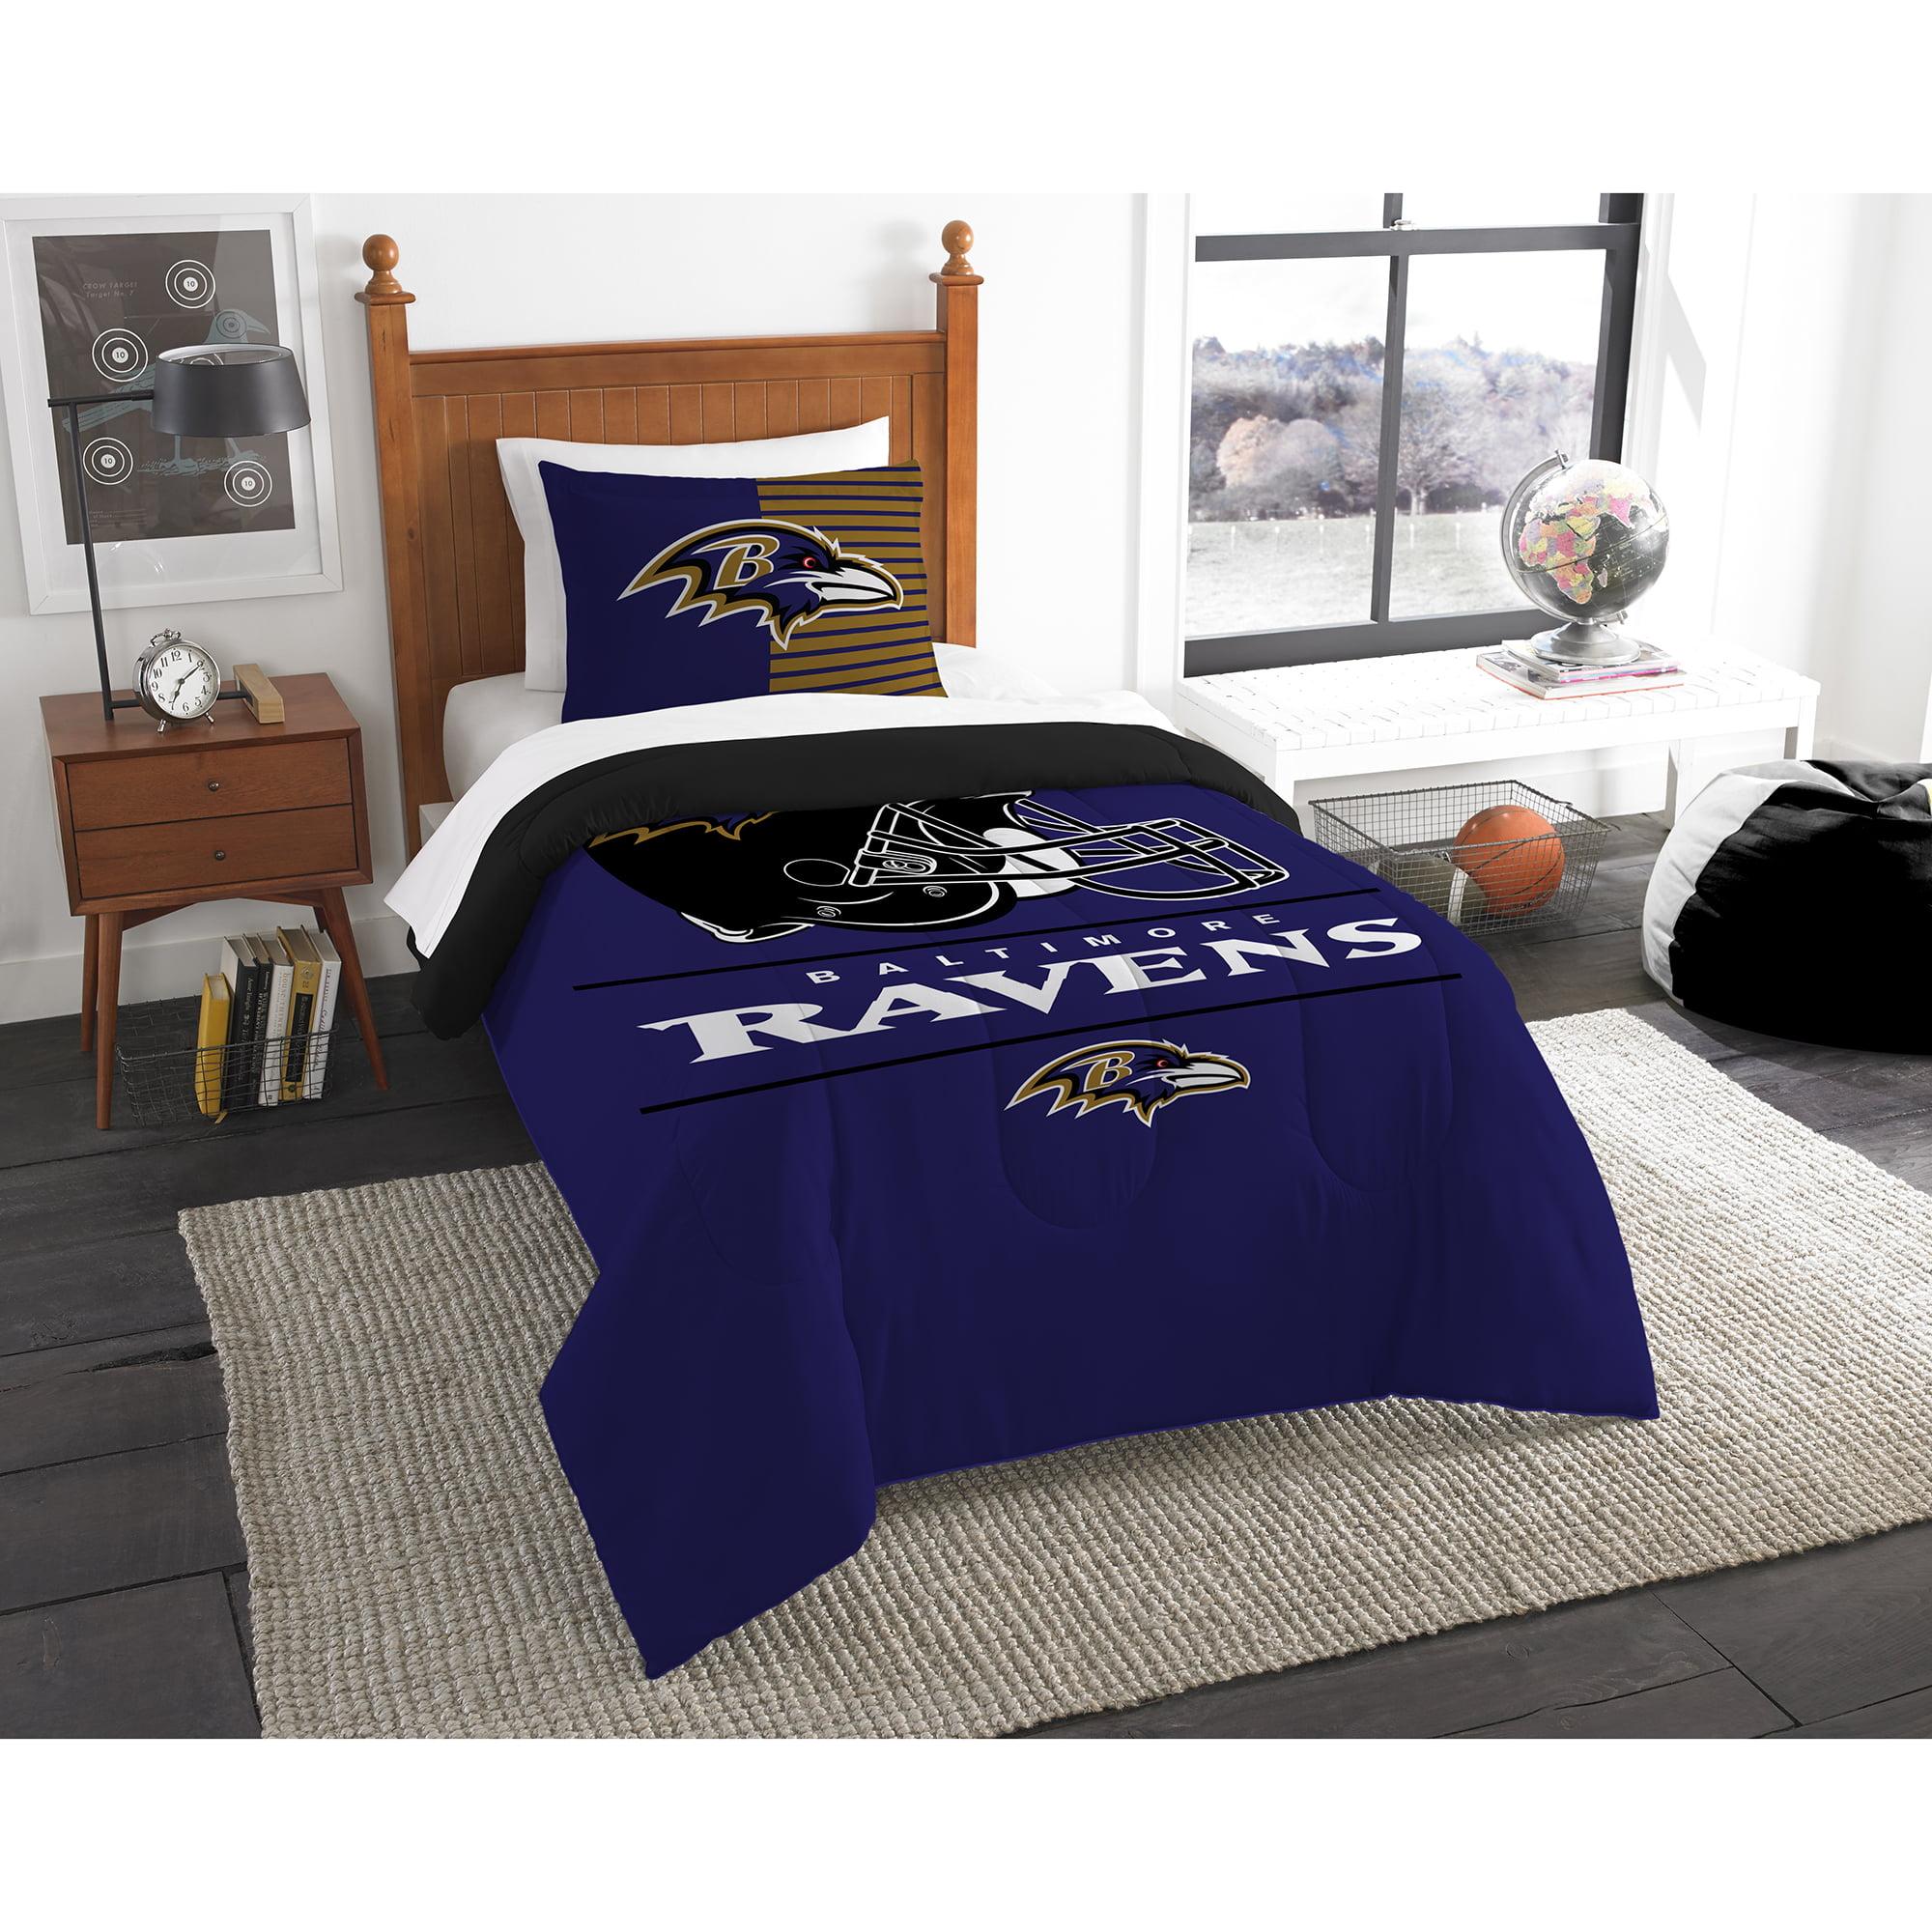 Baltimore Ravens The Northwest Company NFL Draft Twin Comforter Set - No Size